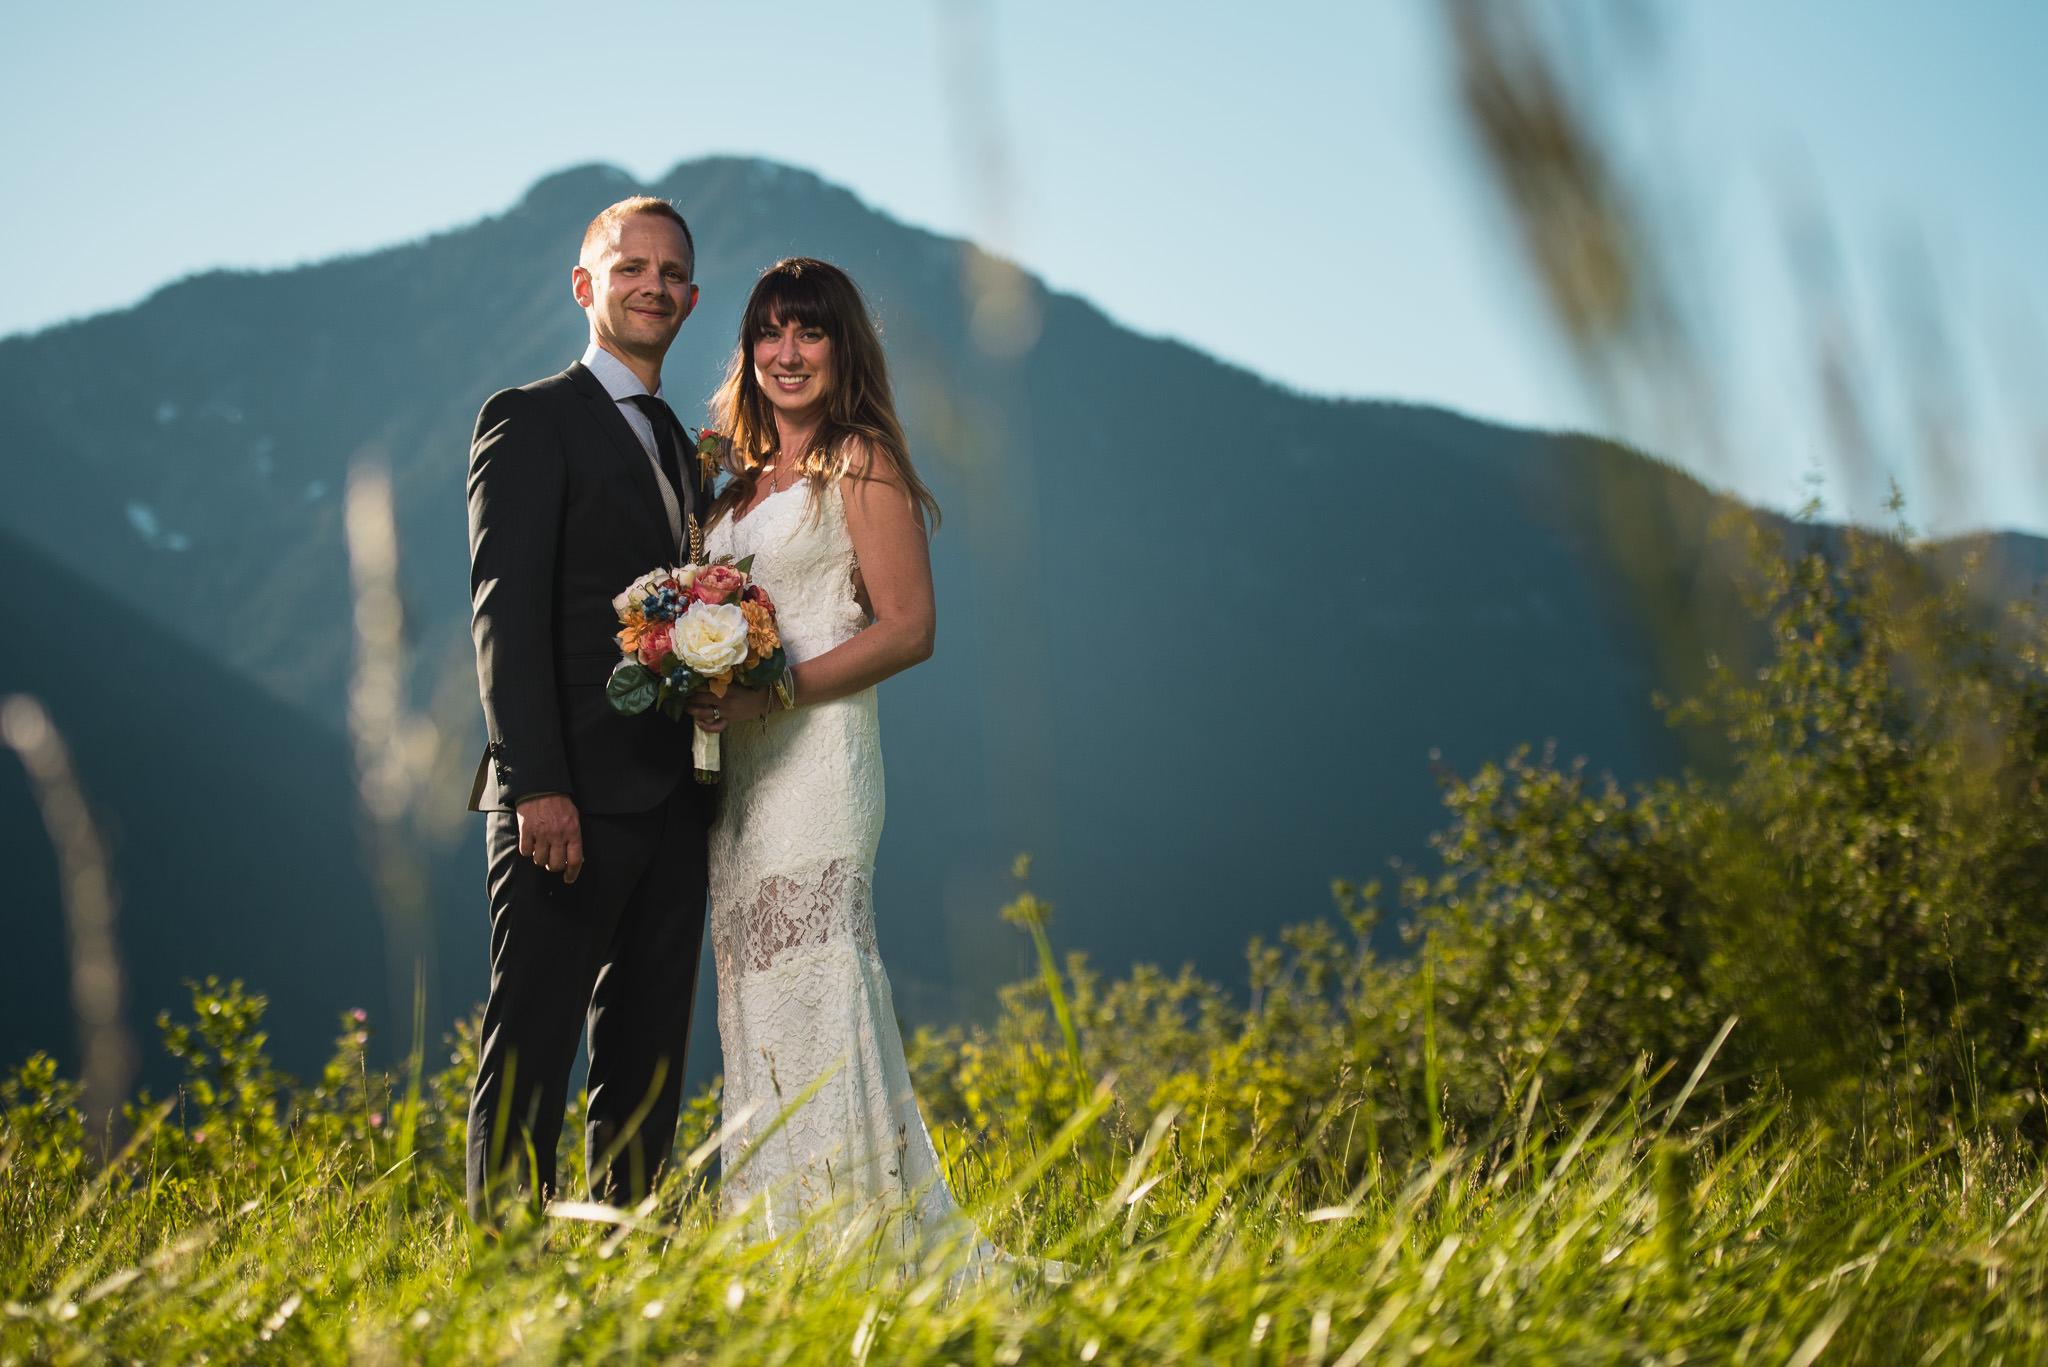 Melanie-Matt-Pitt-Lake-Post-Wedding-Shoot-Victoria-Wedding-Photographers-1.jpg